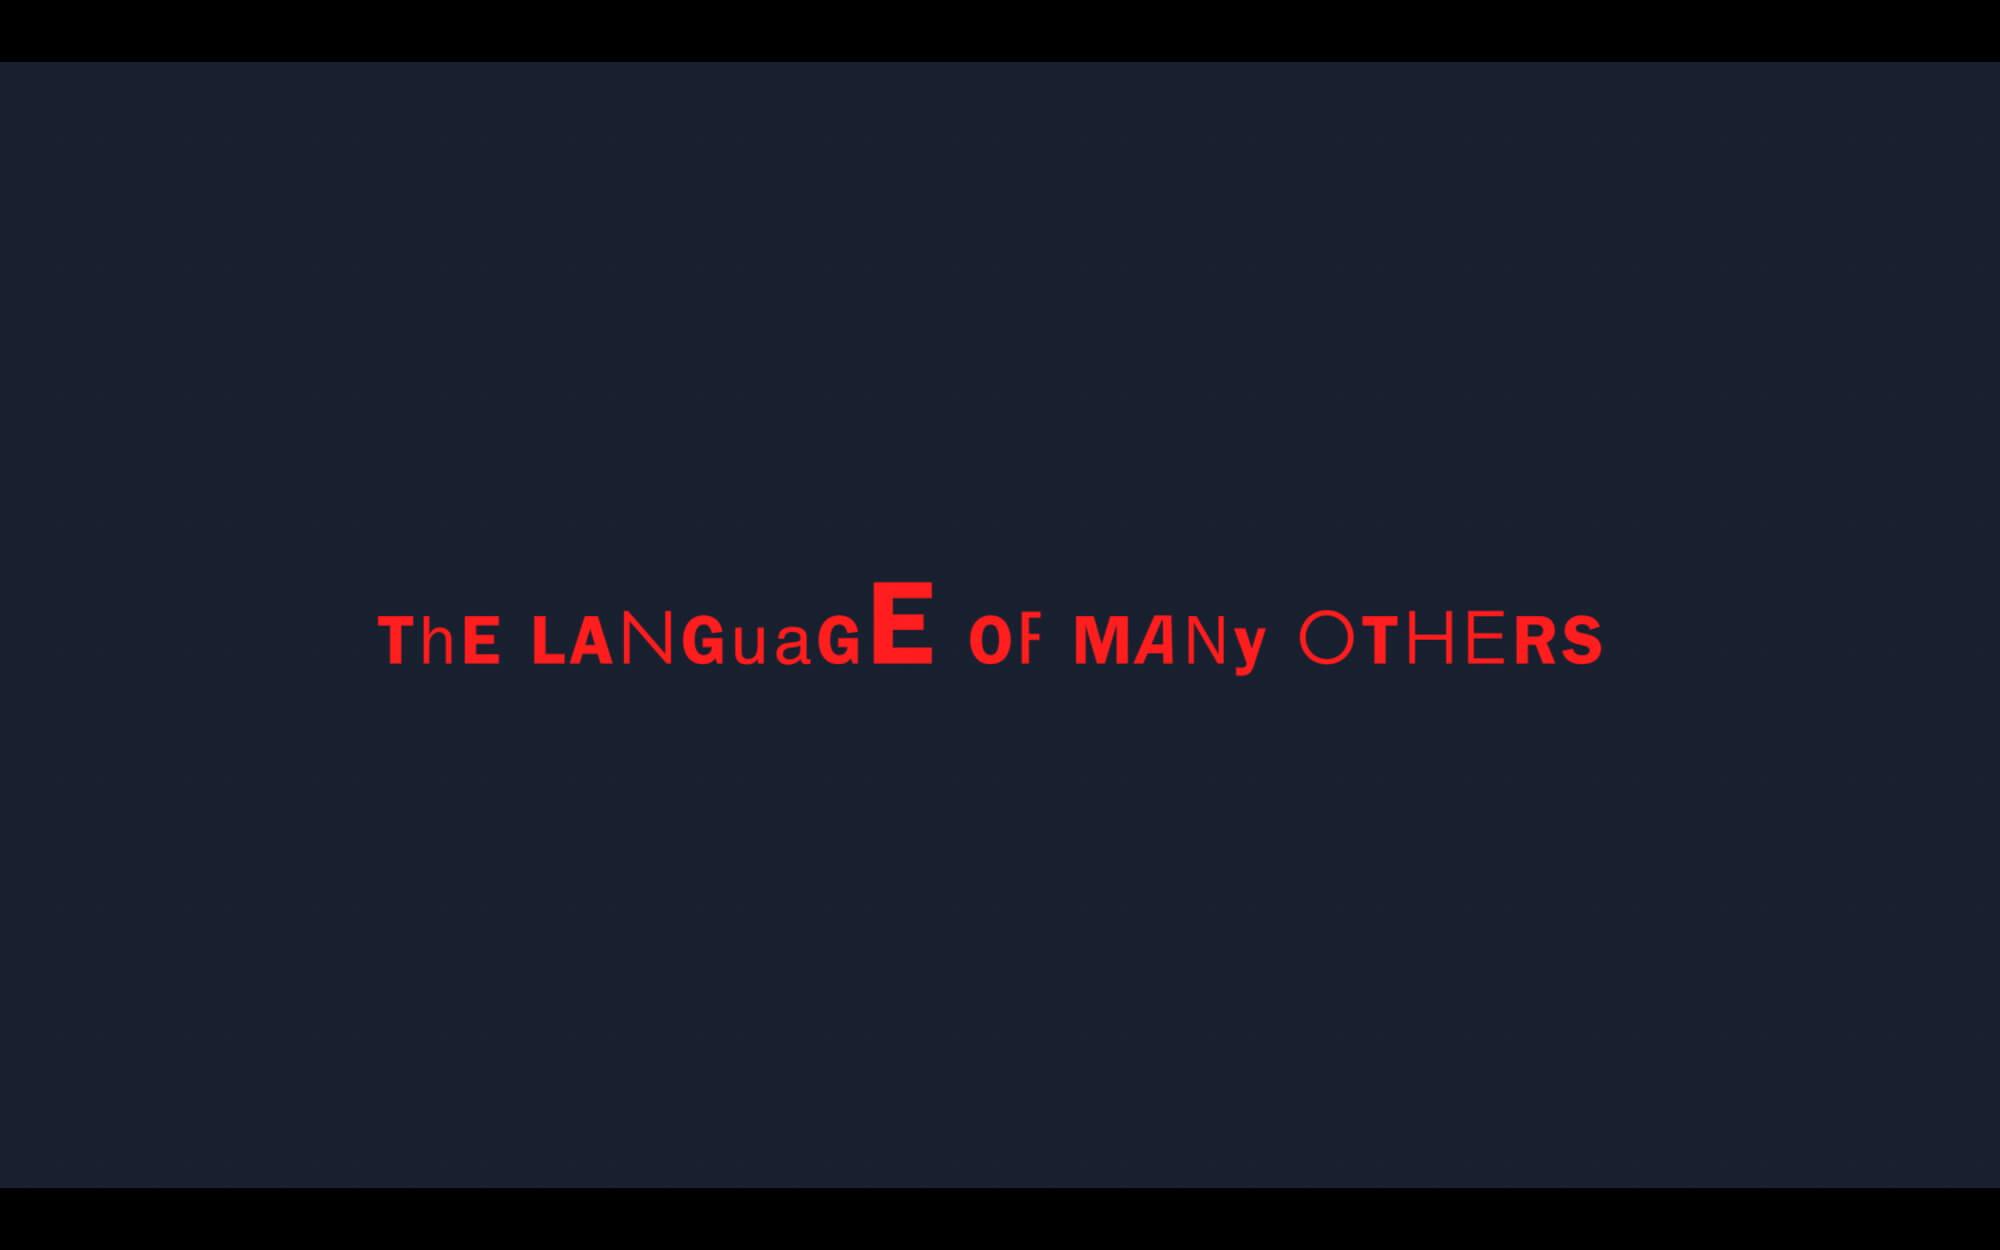 language-of-many-others-31